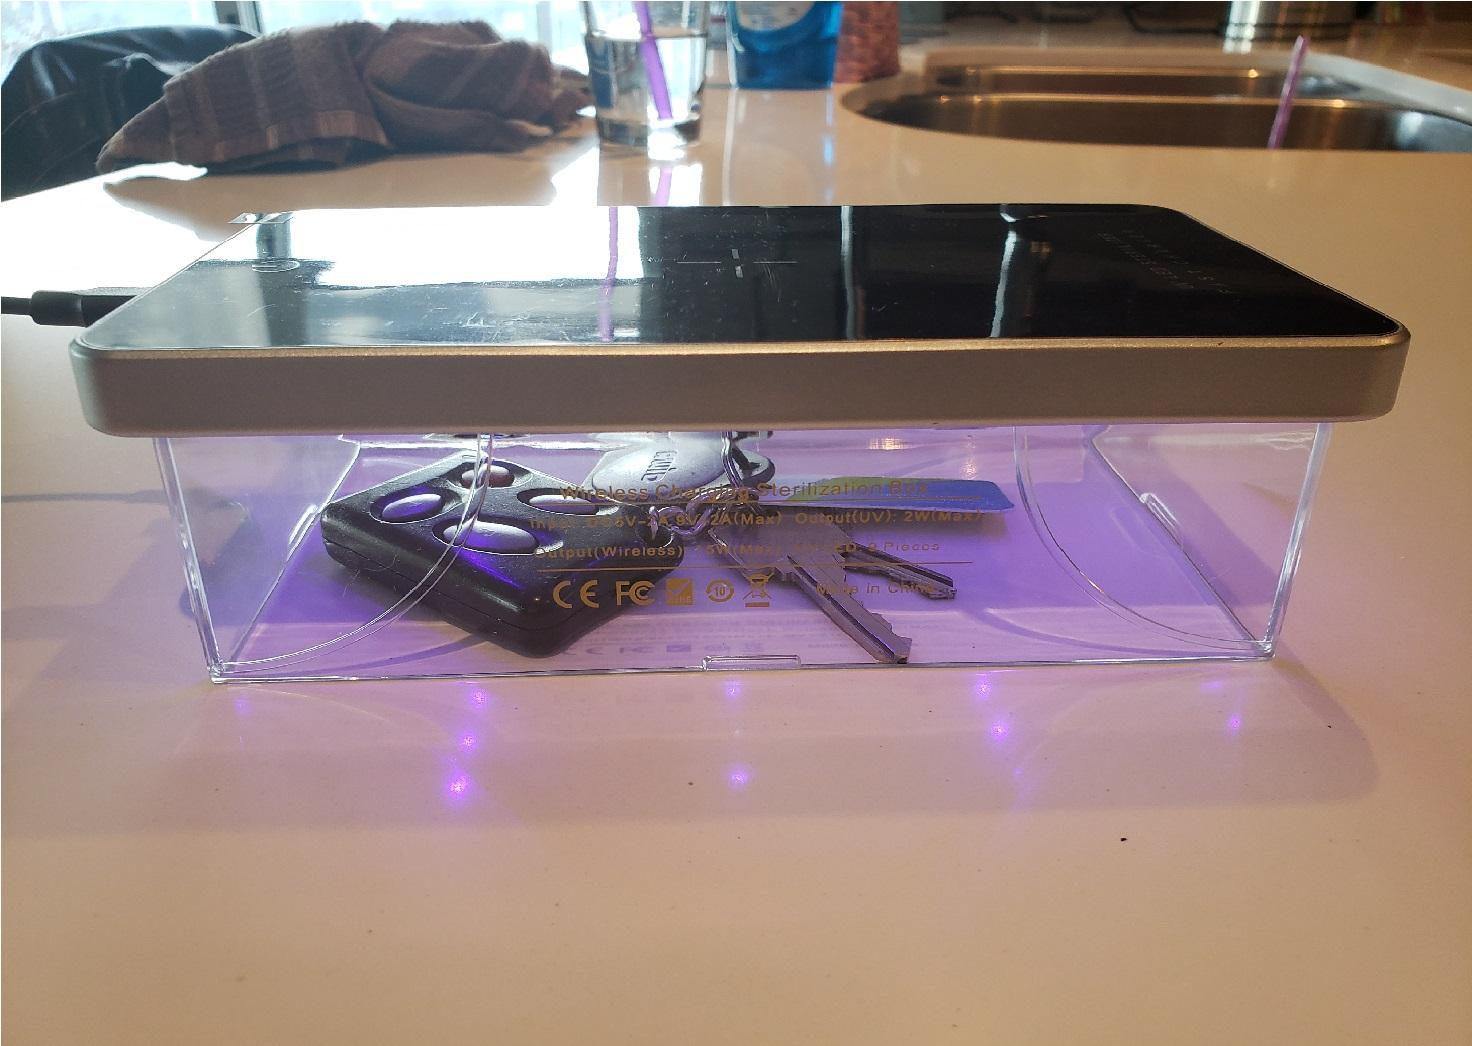 image of the UV sterilizer sanitizing a set of keys with UV light